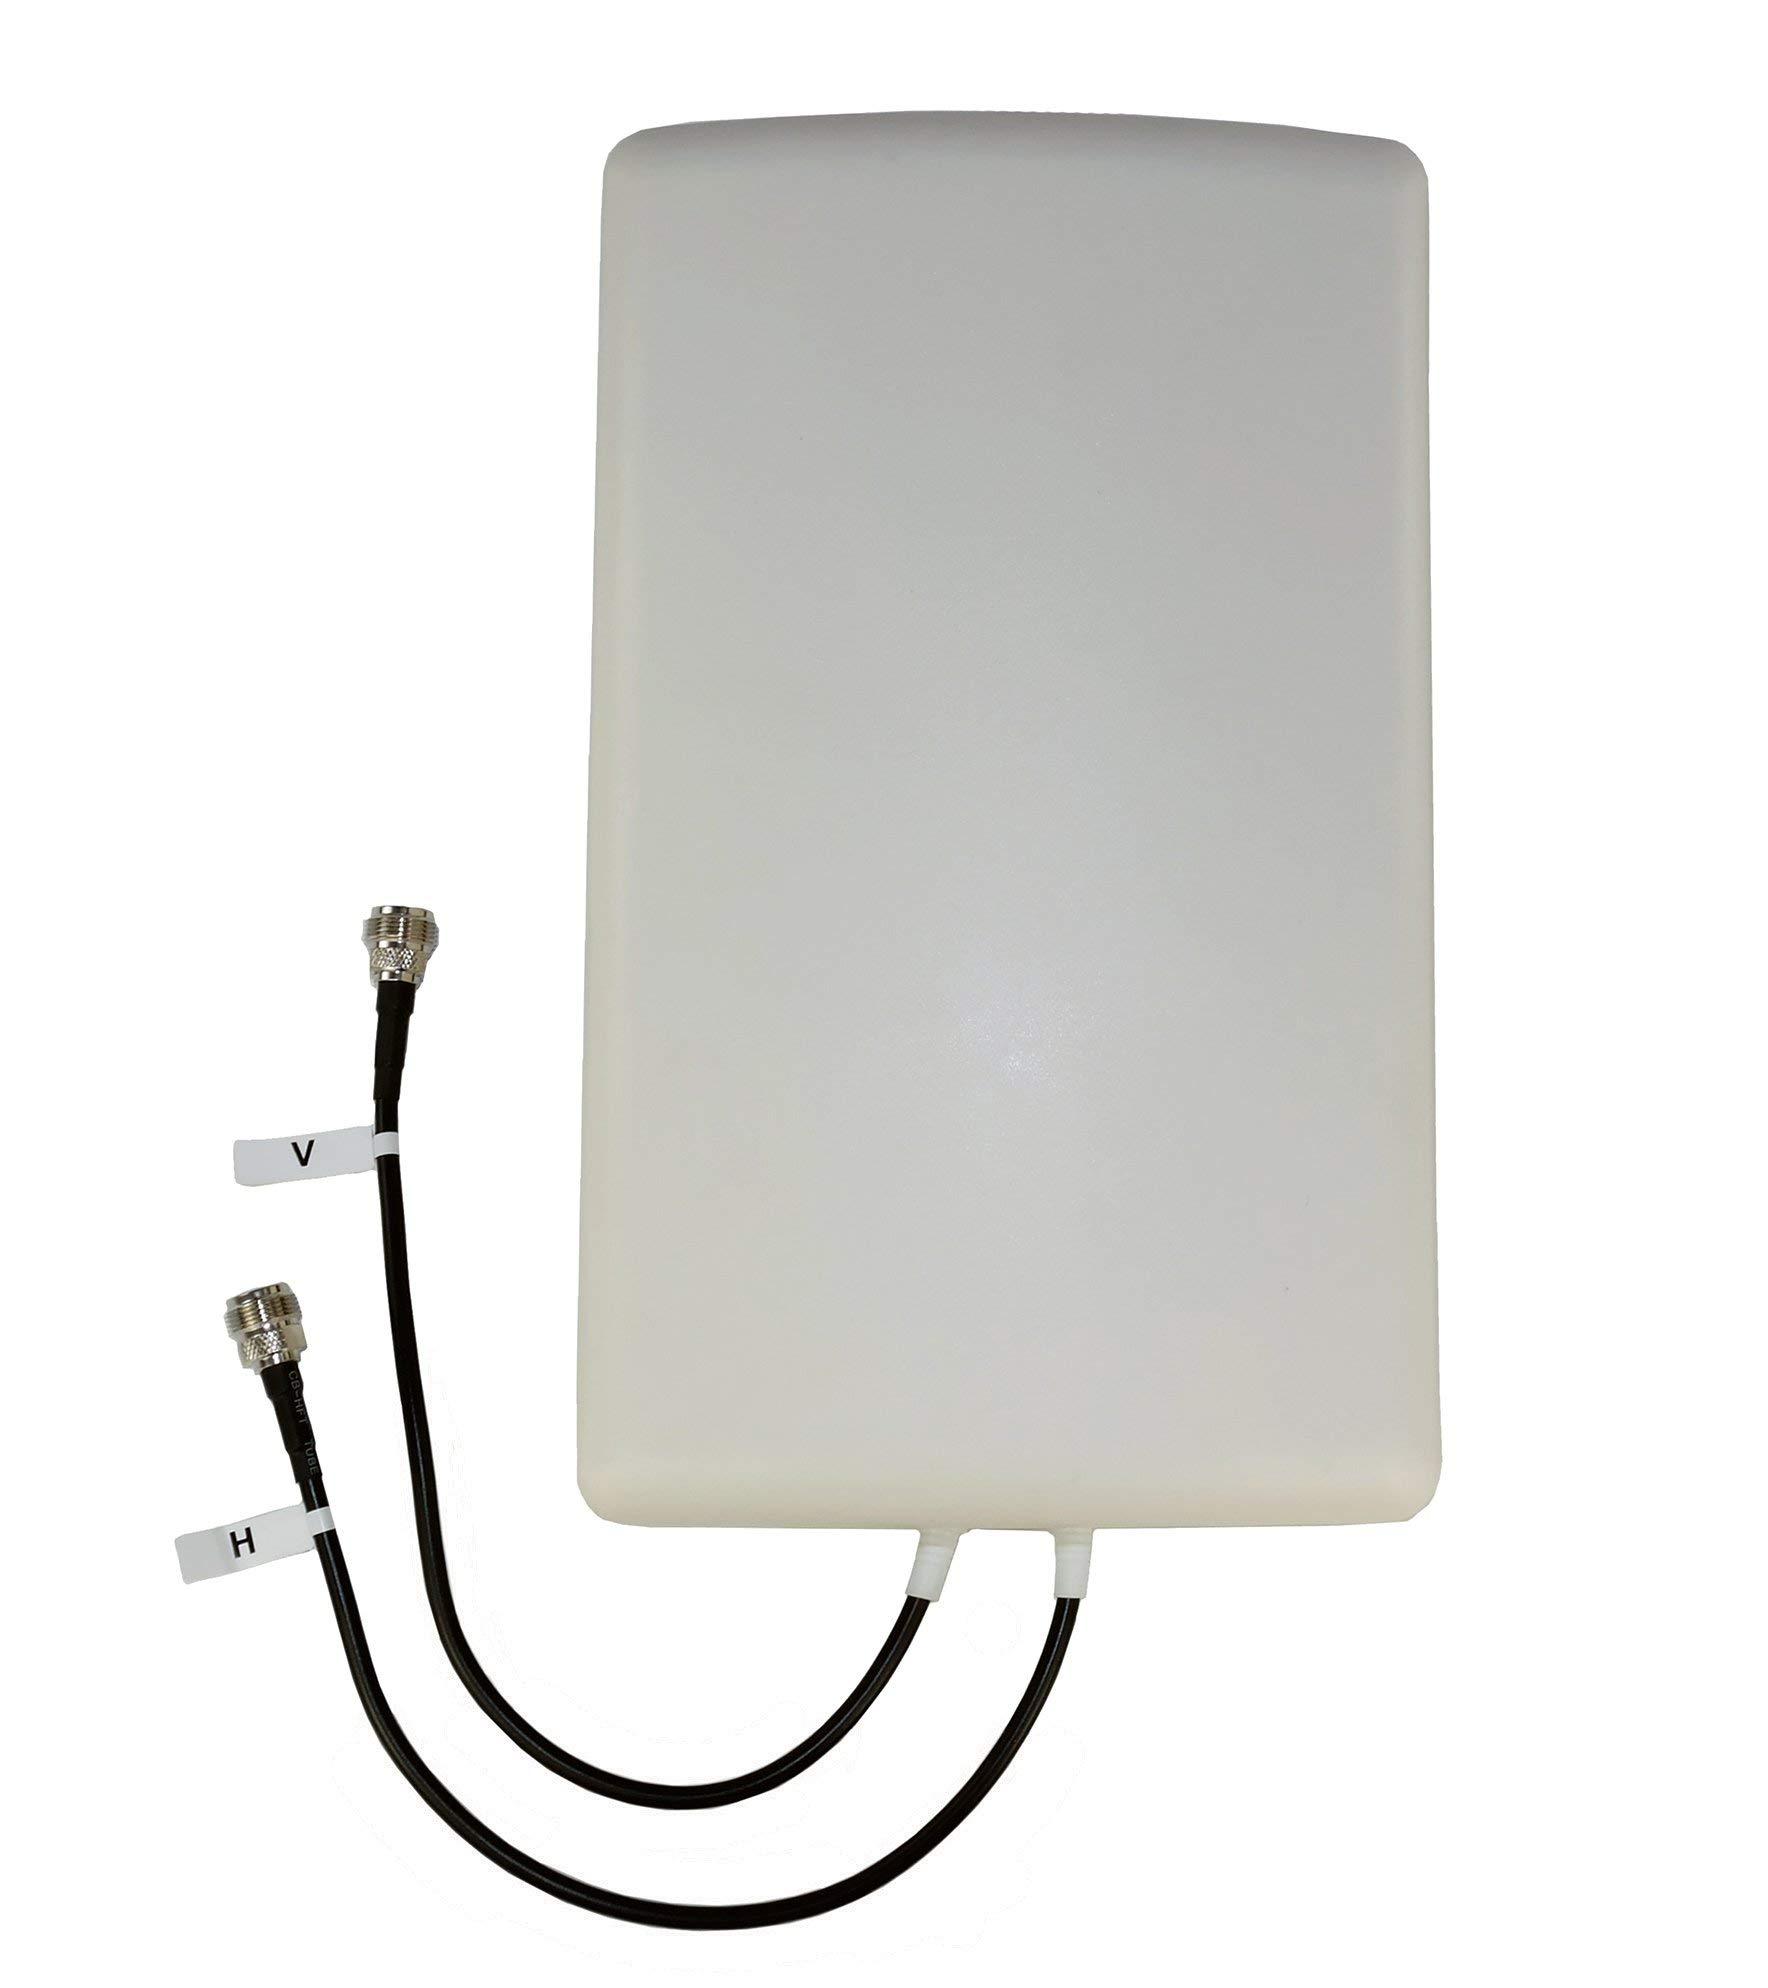 Proxicast 4G/LTE Cross-Polarized (MIMO) 7-10 dBi High-Gain Fixed-Mount Panel Antenna (Renewed)